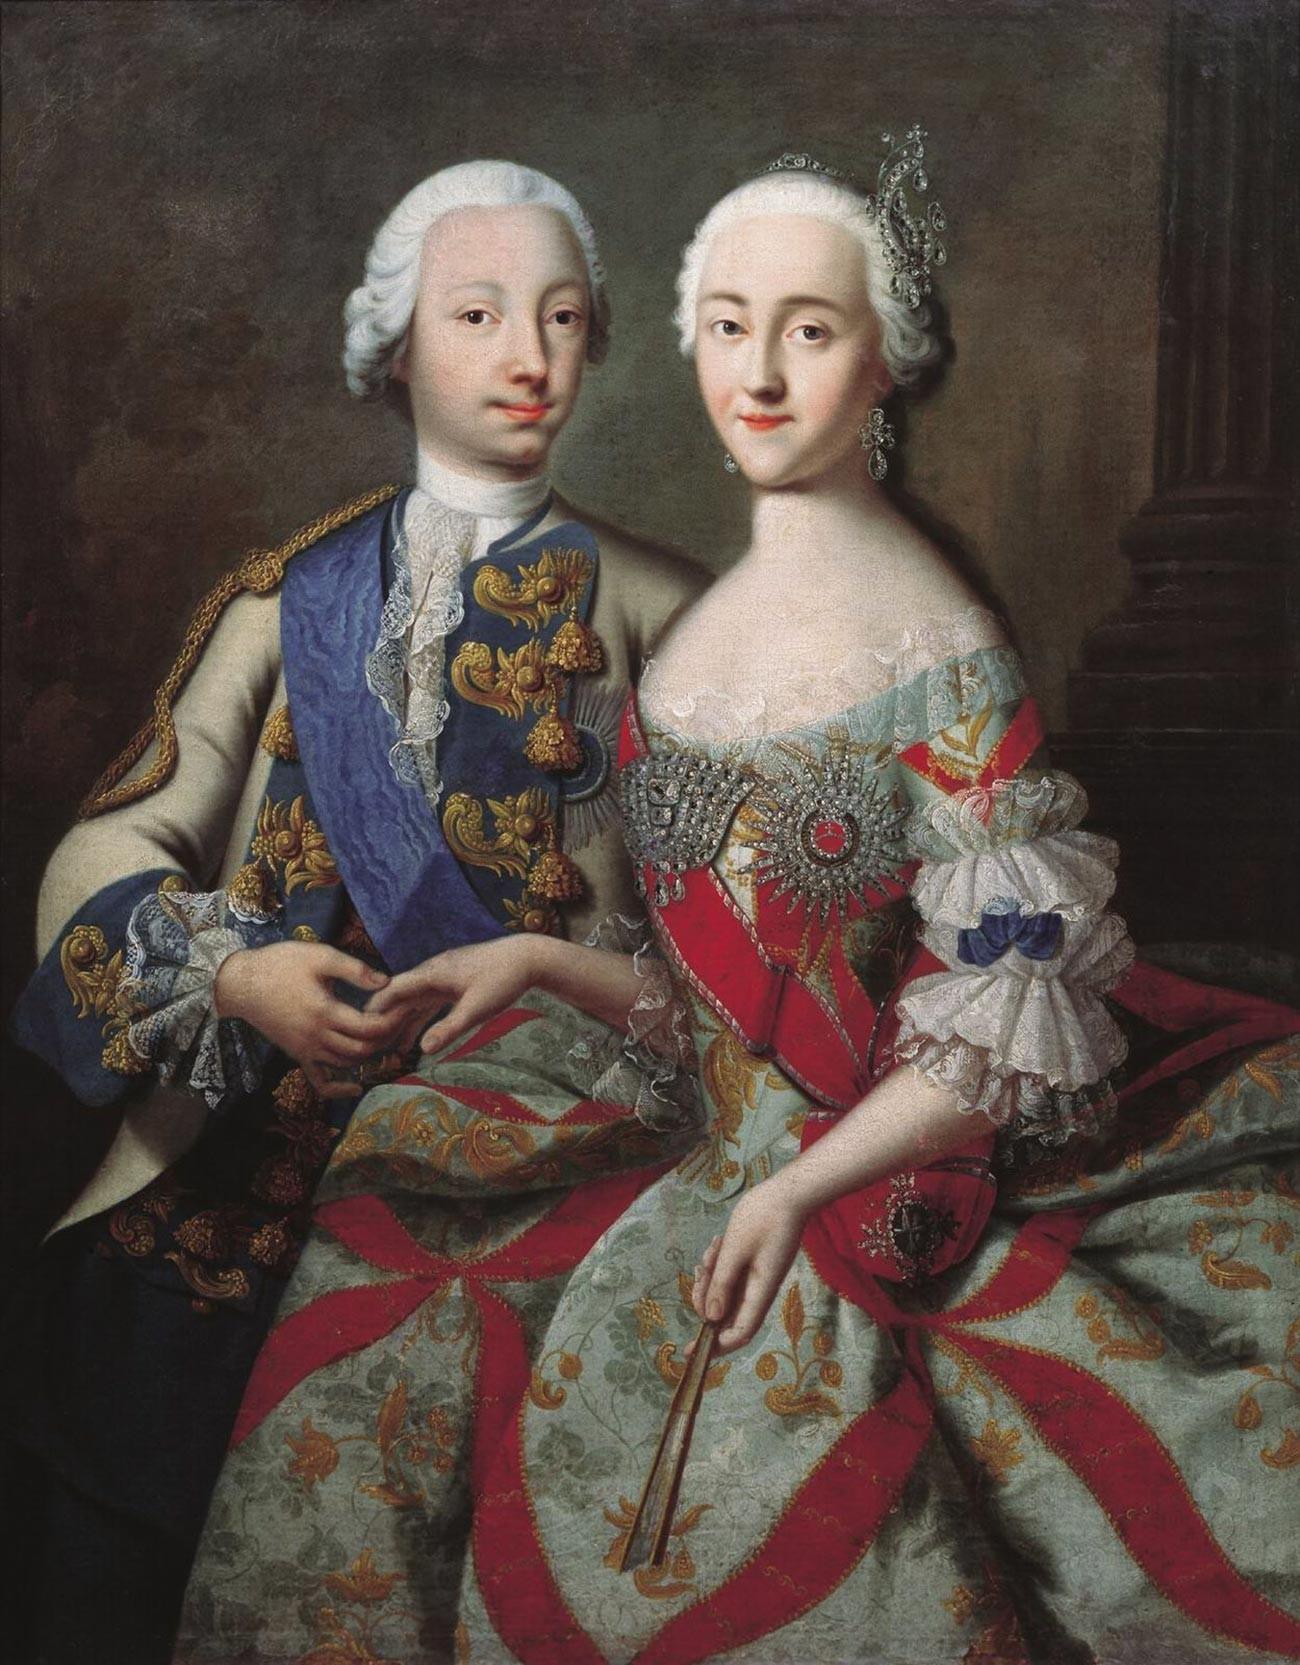 Pedro e Catarina (antes de Pedro se tornar imperador).